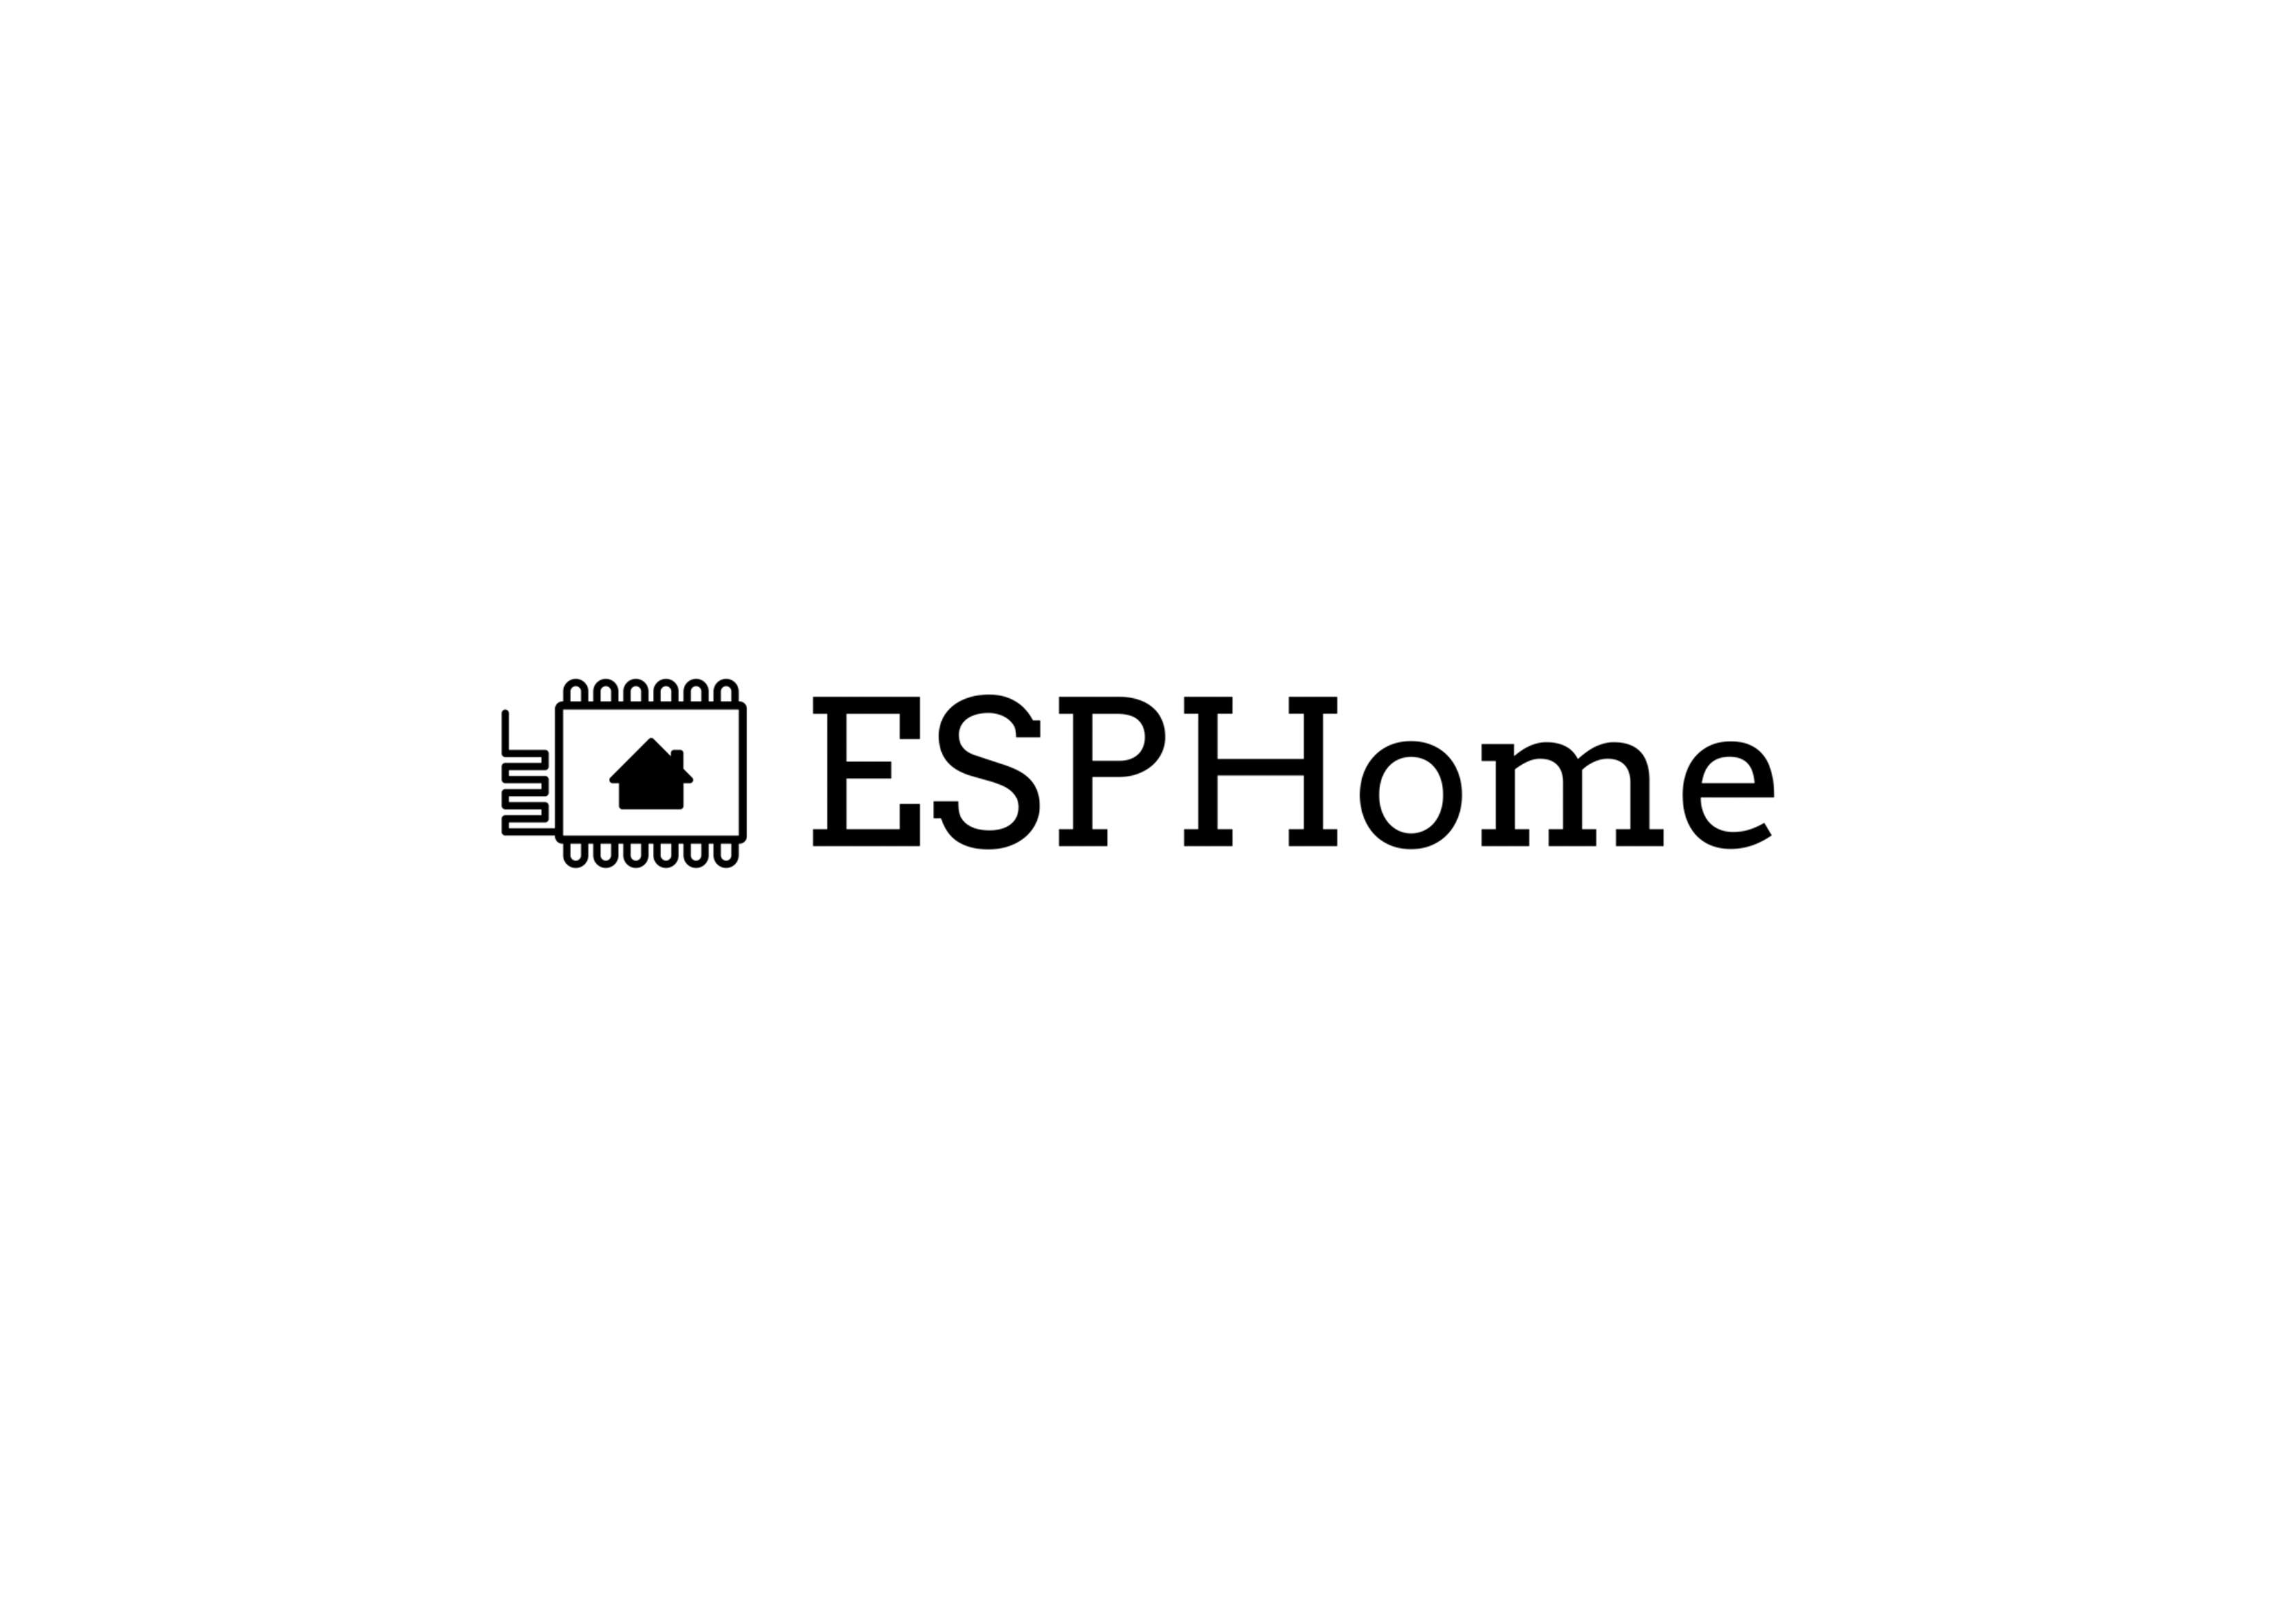 Esphome output